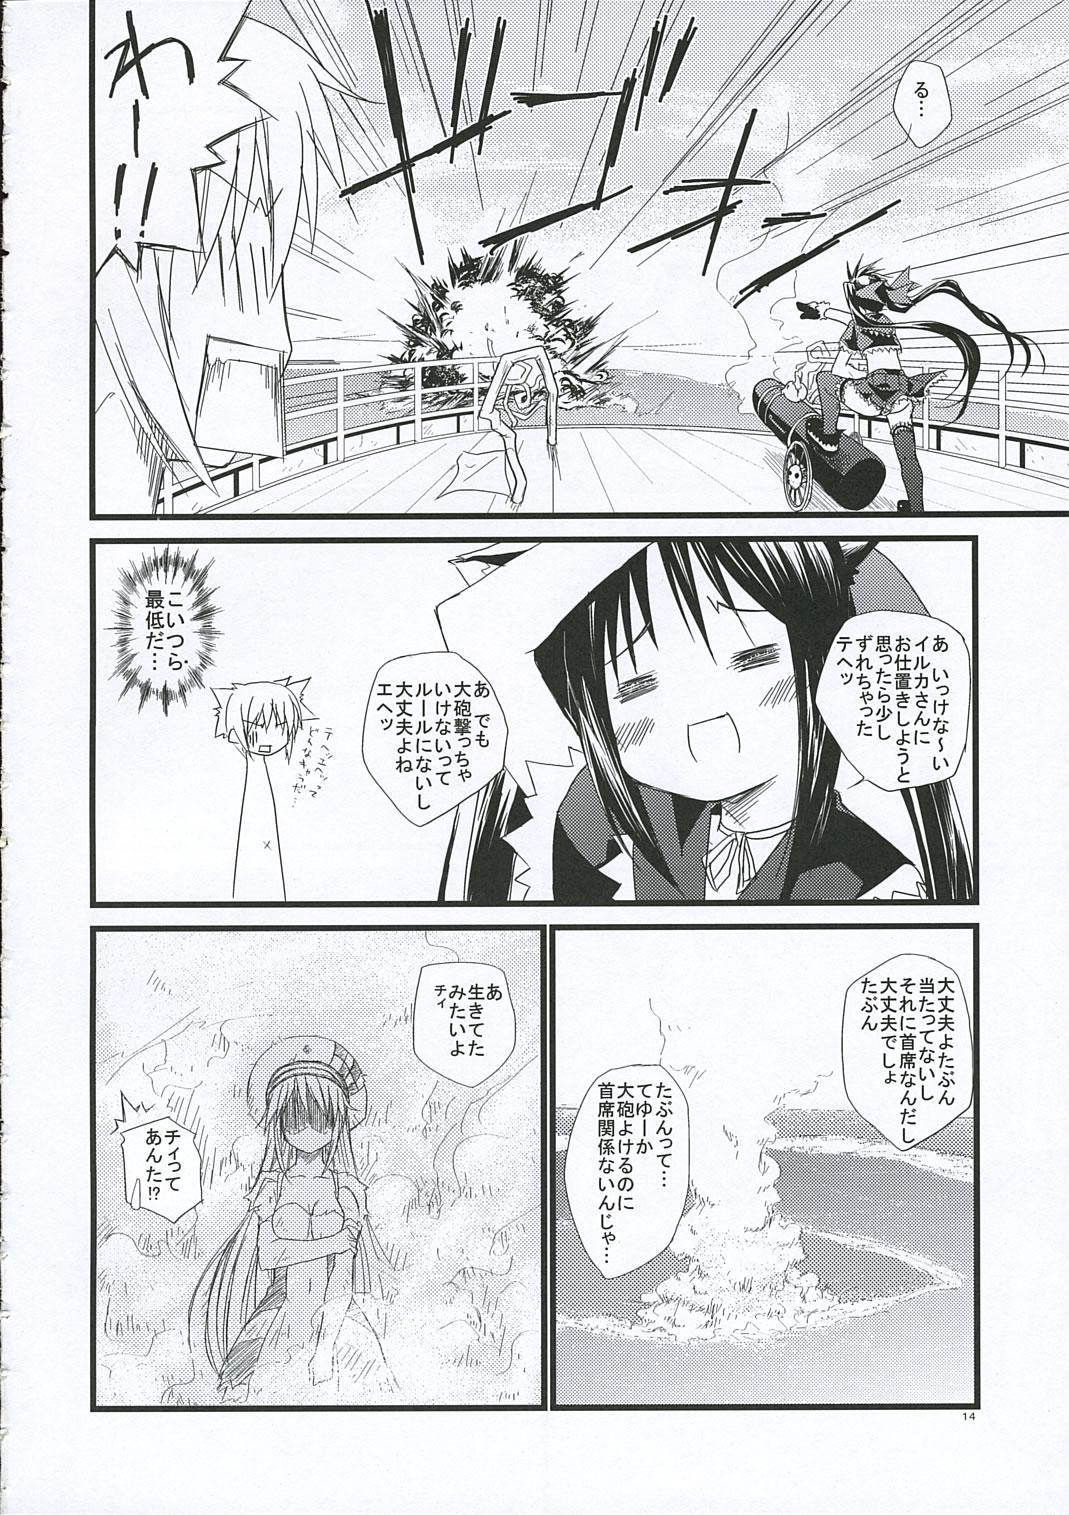 Minatekishugi] Voyage 12